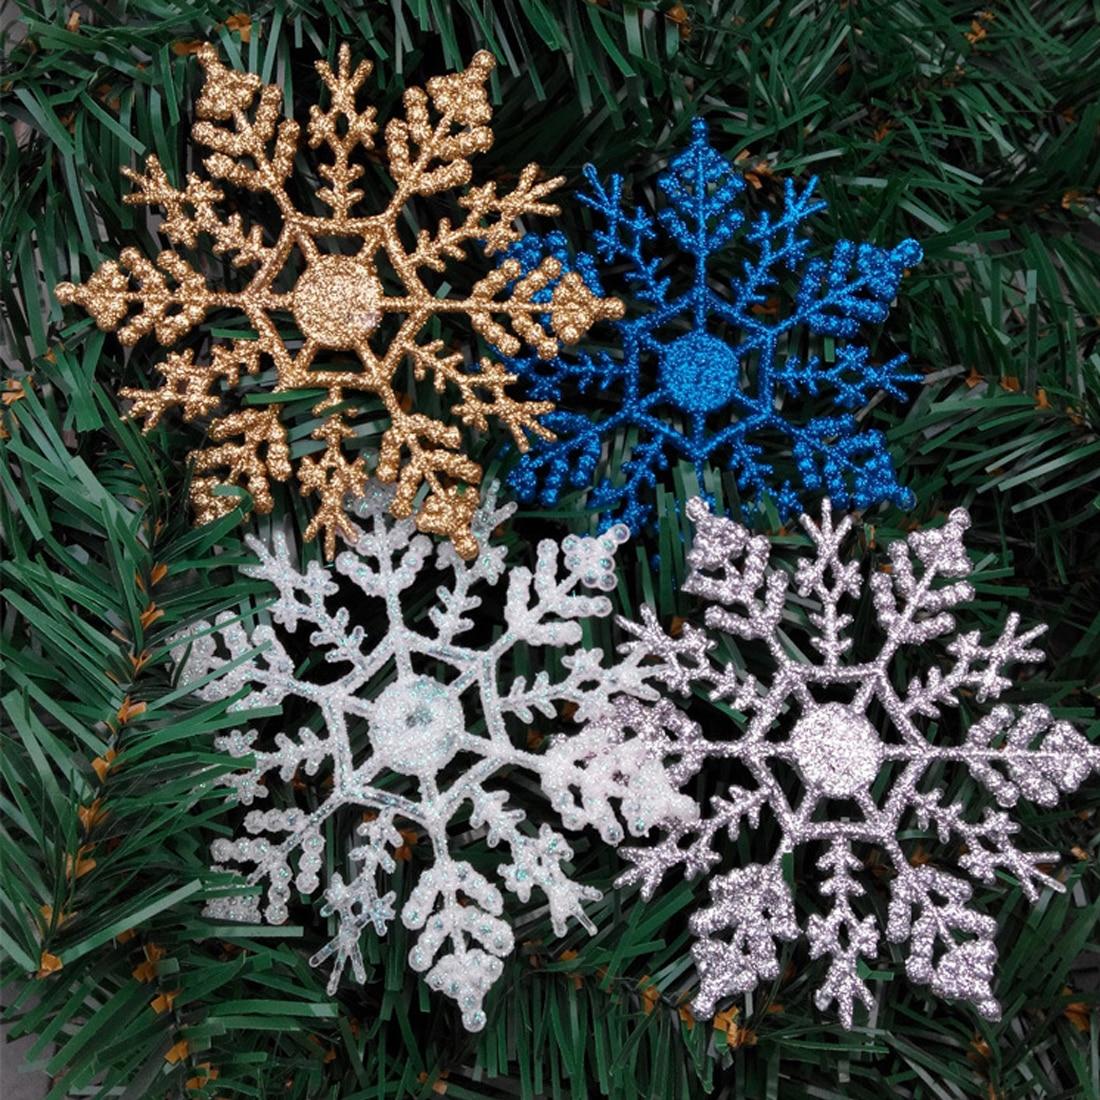 12pcs 10cm gold powder snowflake for xmas charming white christmas tree decor xmas party holiday christmas - Christmas Tree Decorations Gold And Blue